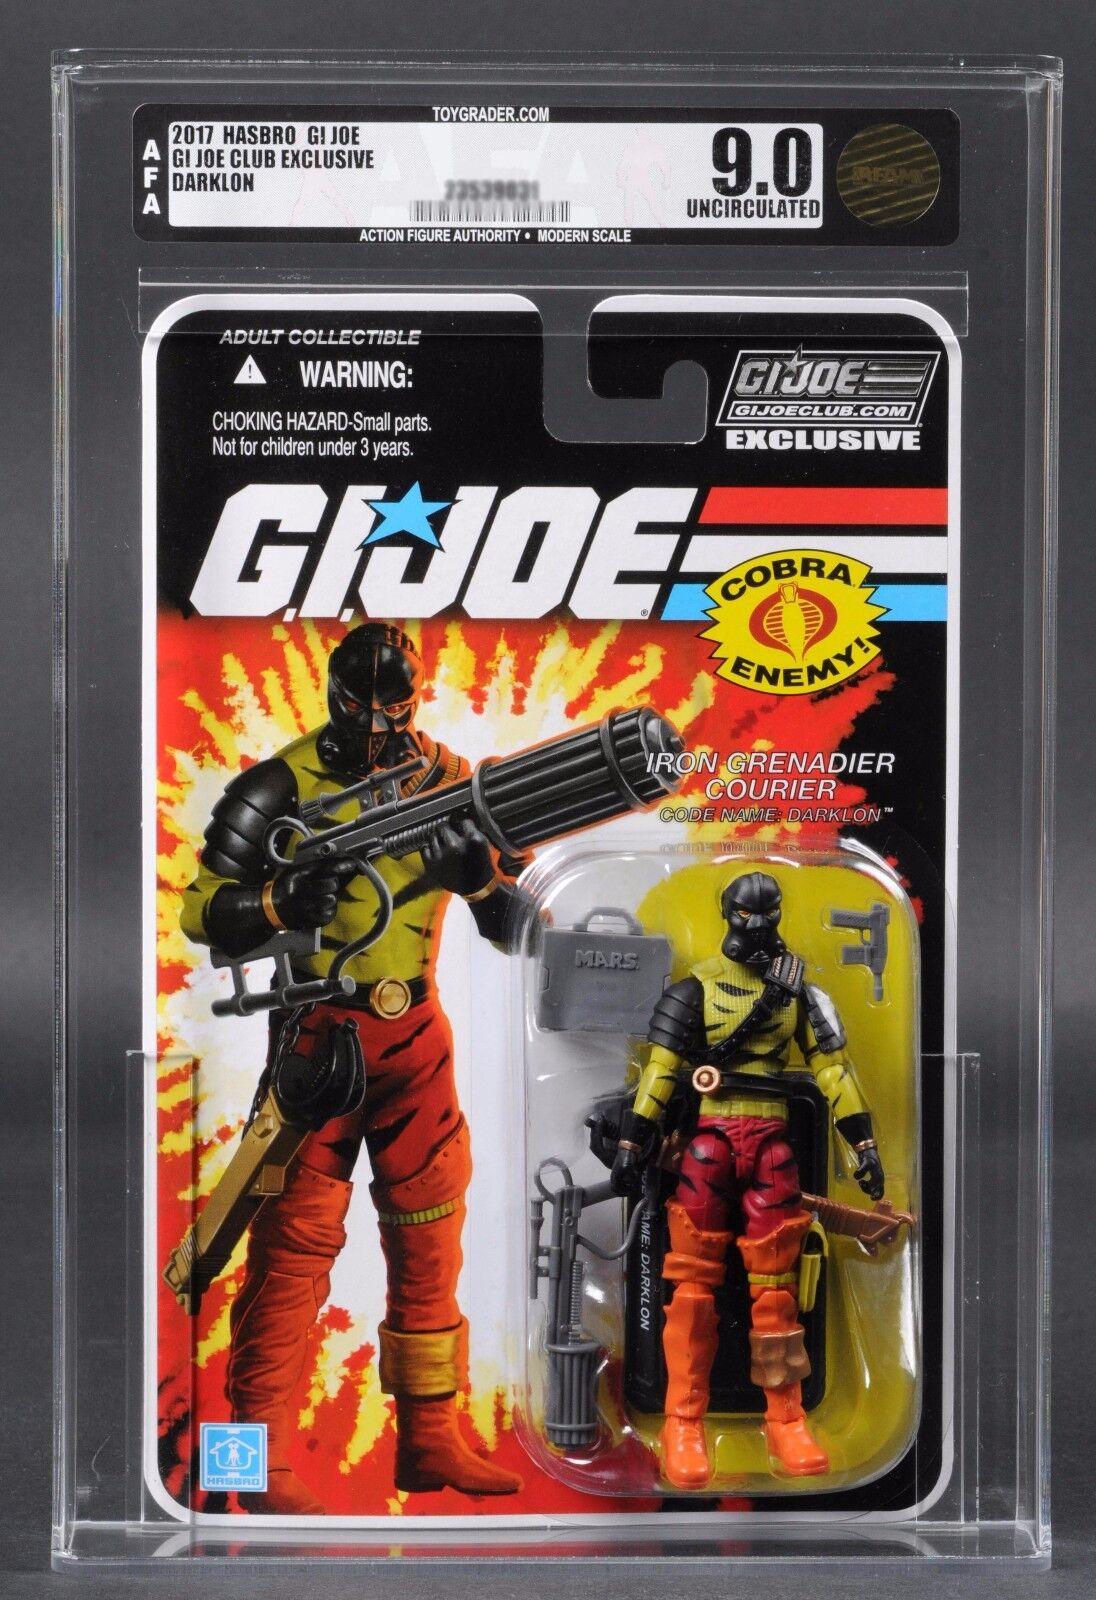 2017 GI Joe Iron Grenadier Darklon AFA U9.0 Club Exclusive Subscription FSS 5.0